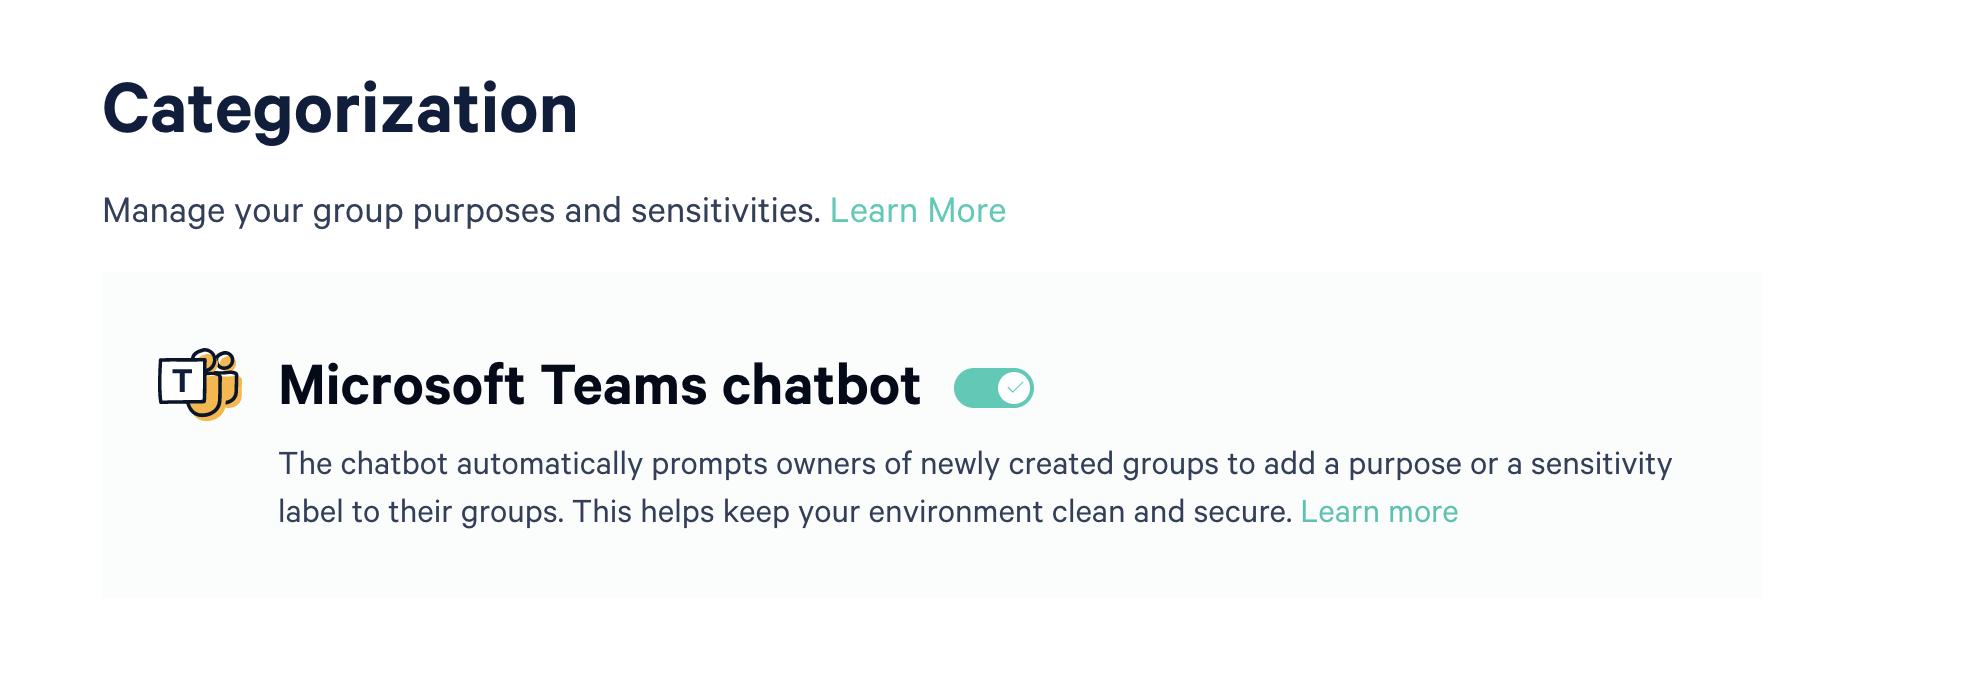 Screenshot of toggle to activate Microsoft Teams chatbot.